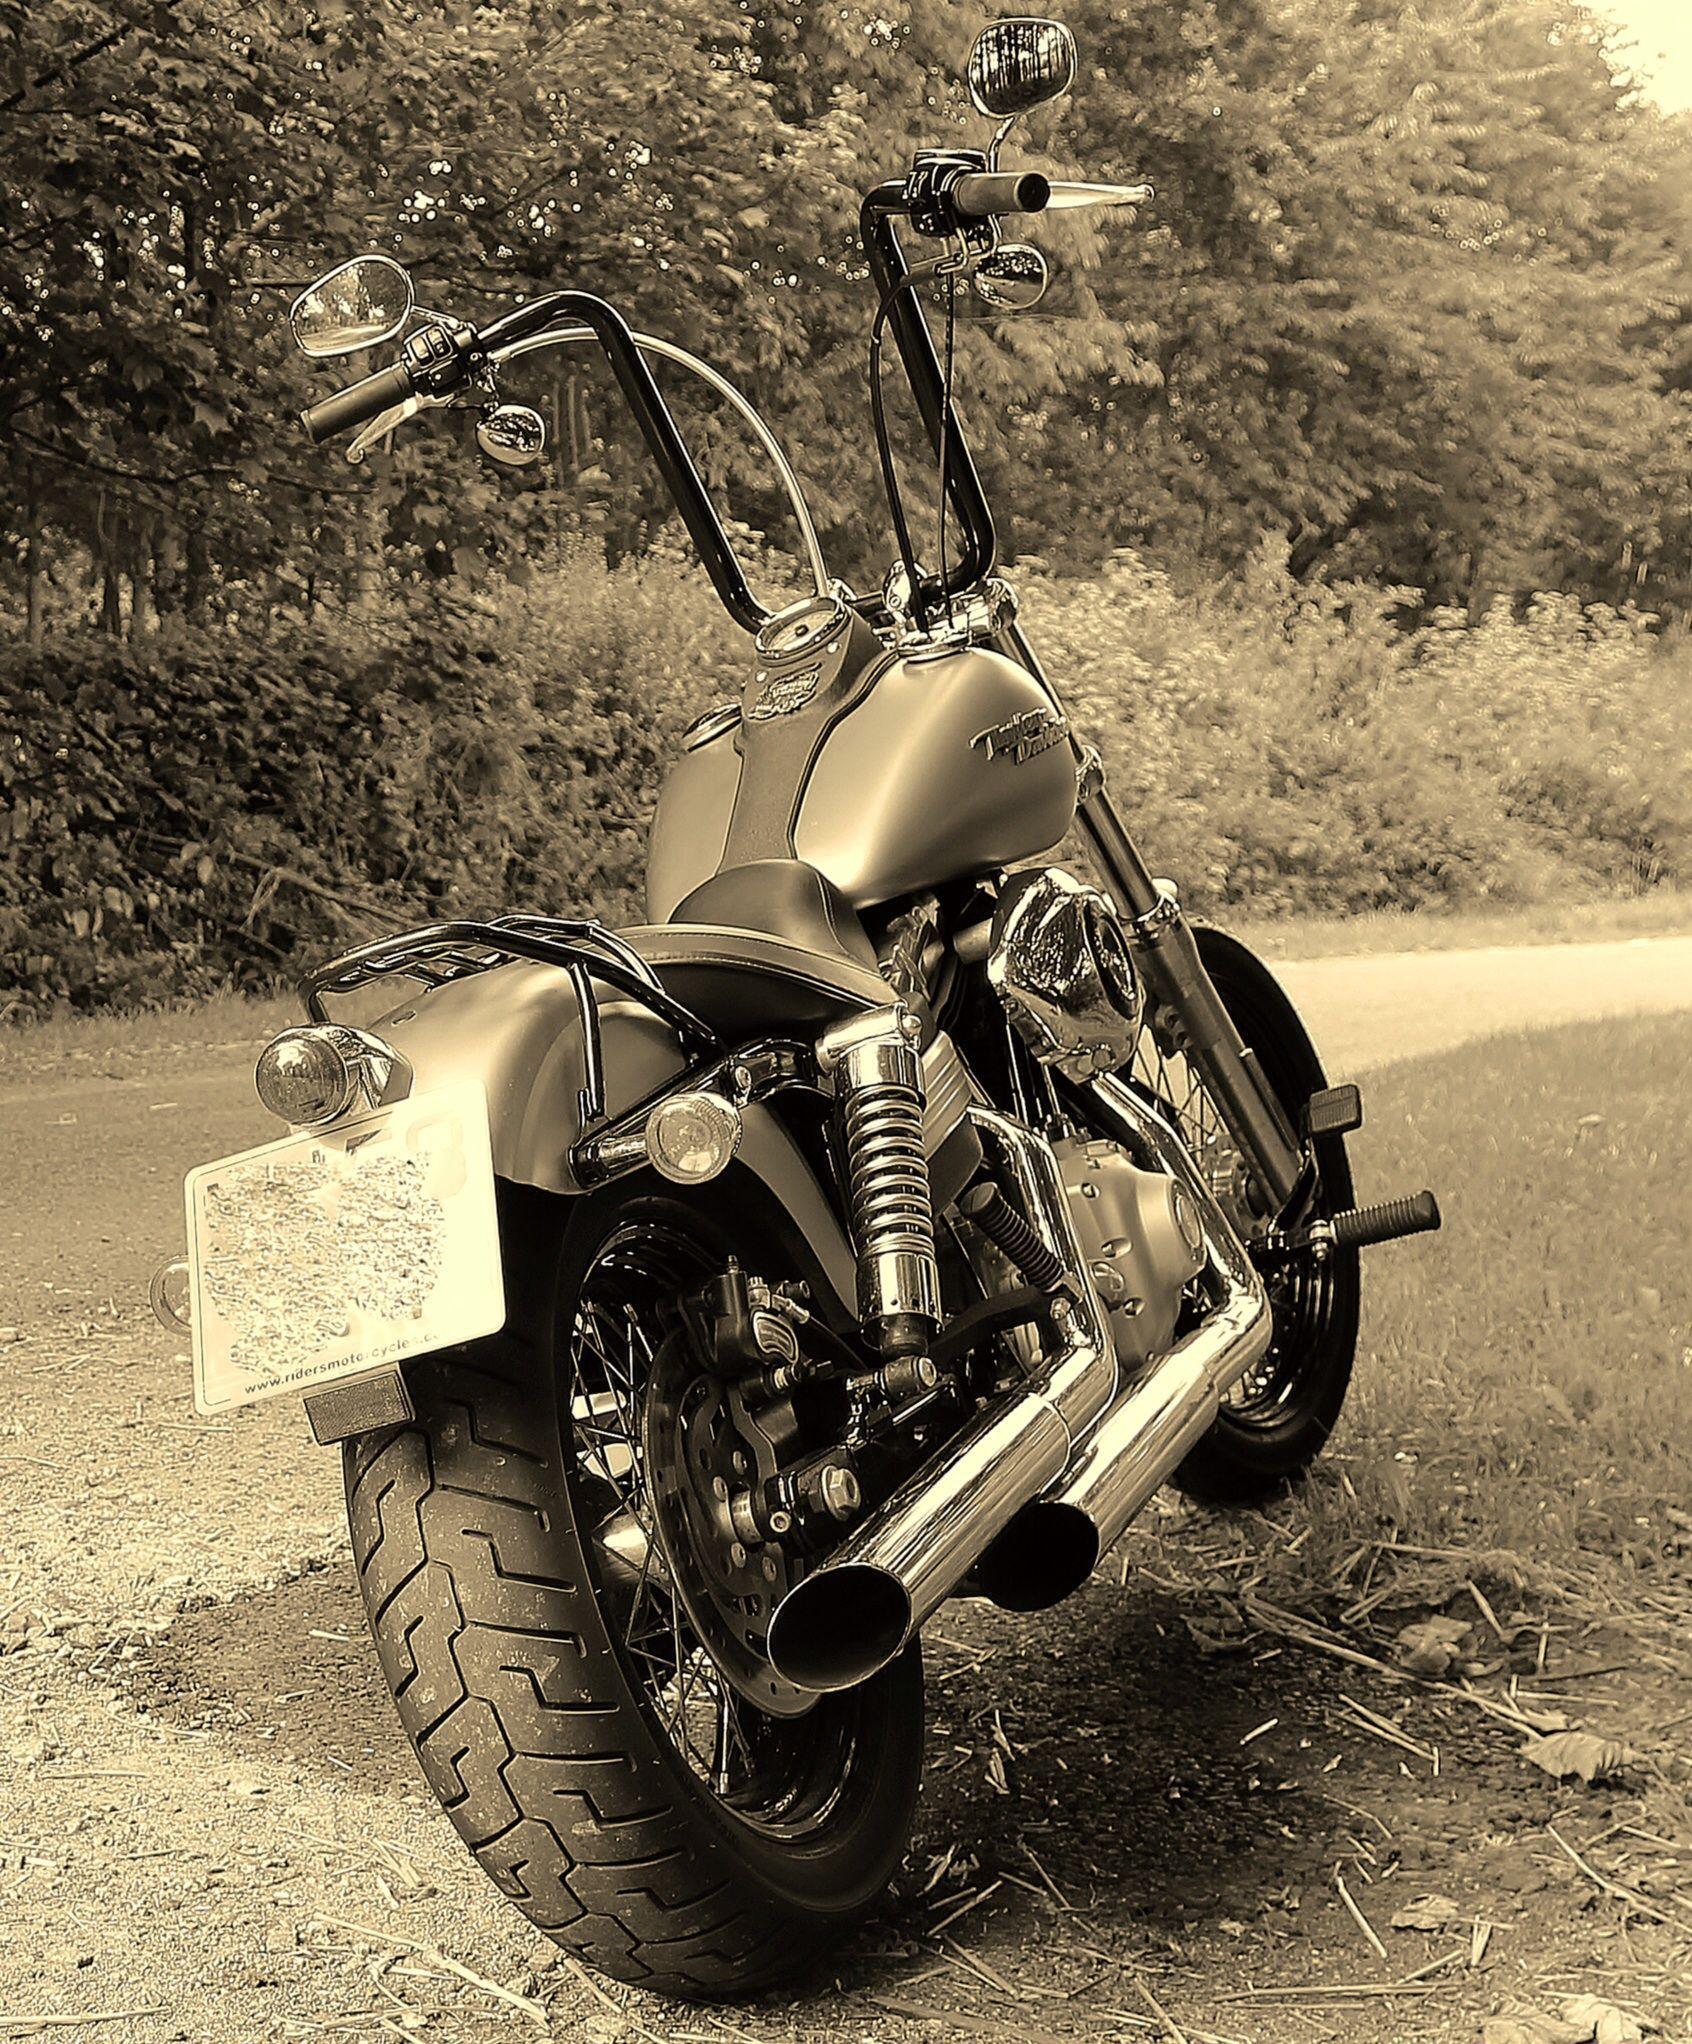 Harley Davidson FXDB Dyna Street Bob Harley davidson